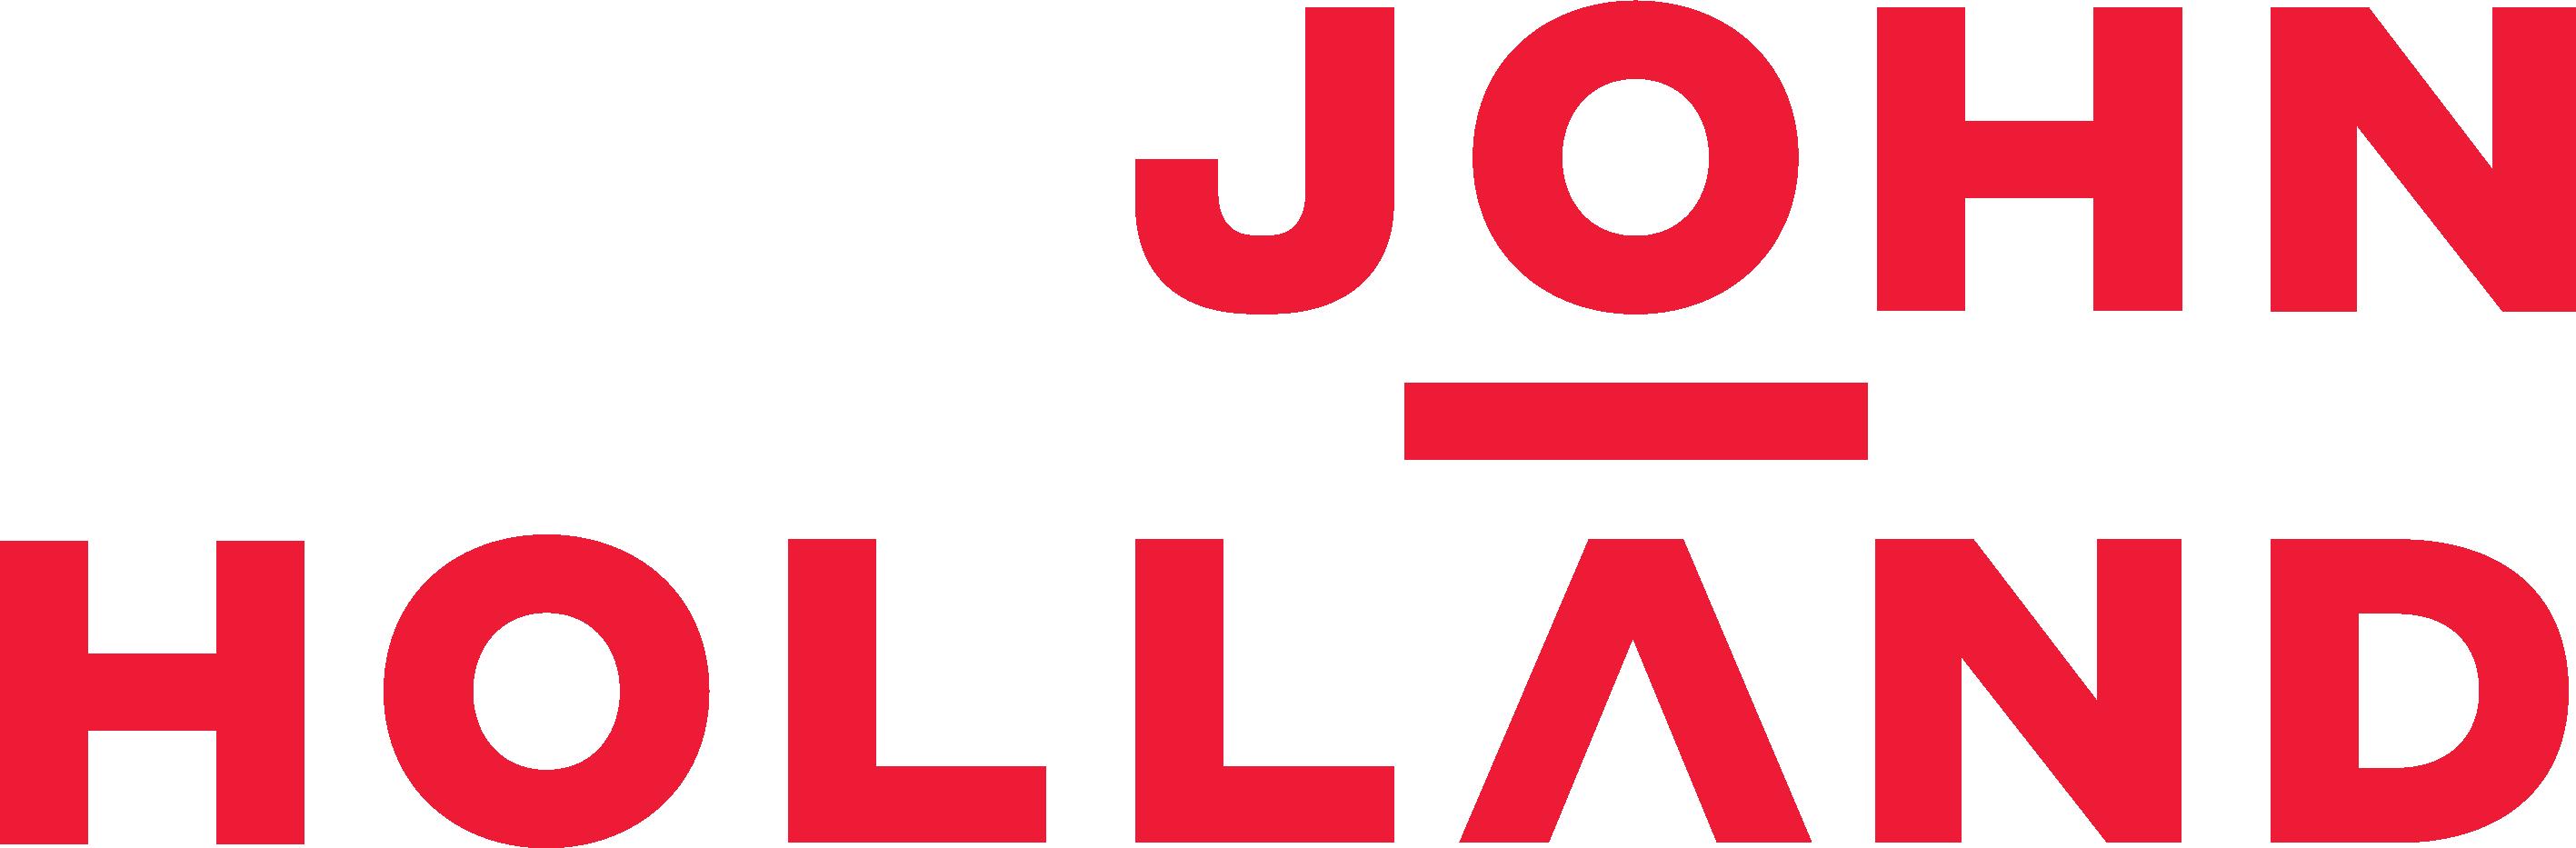 John_Holland_Logo